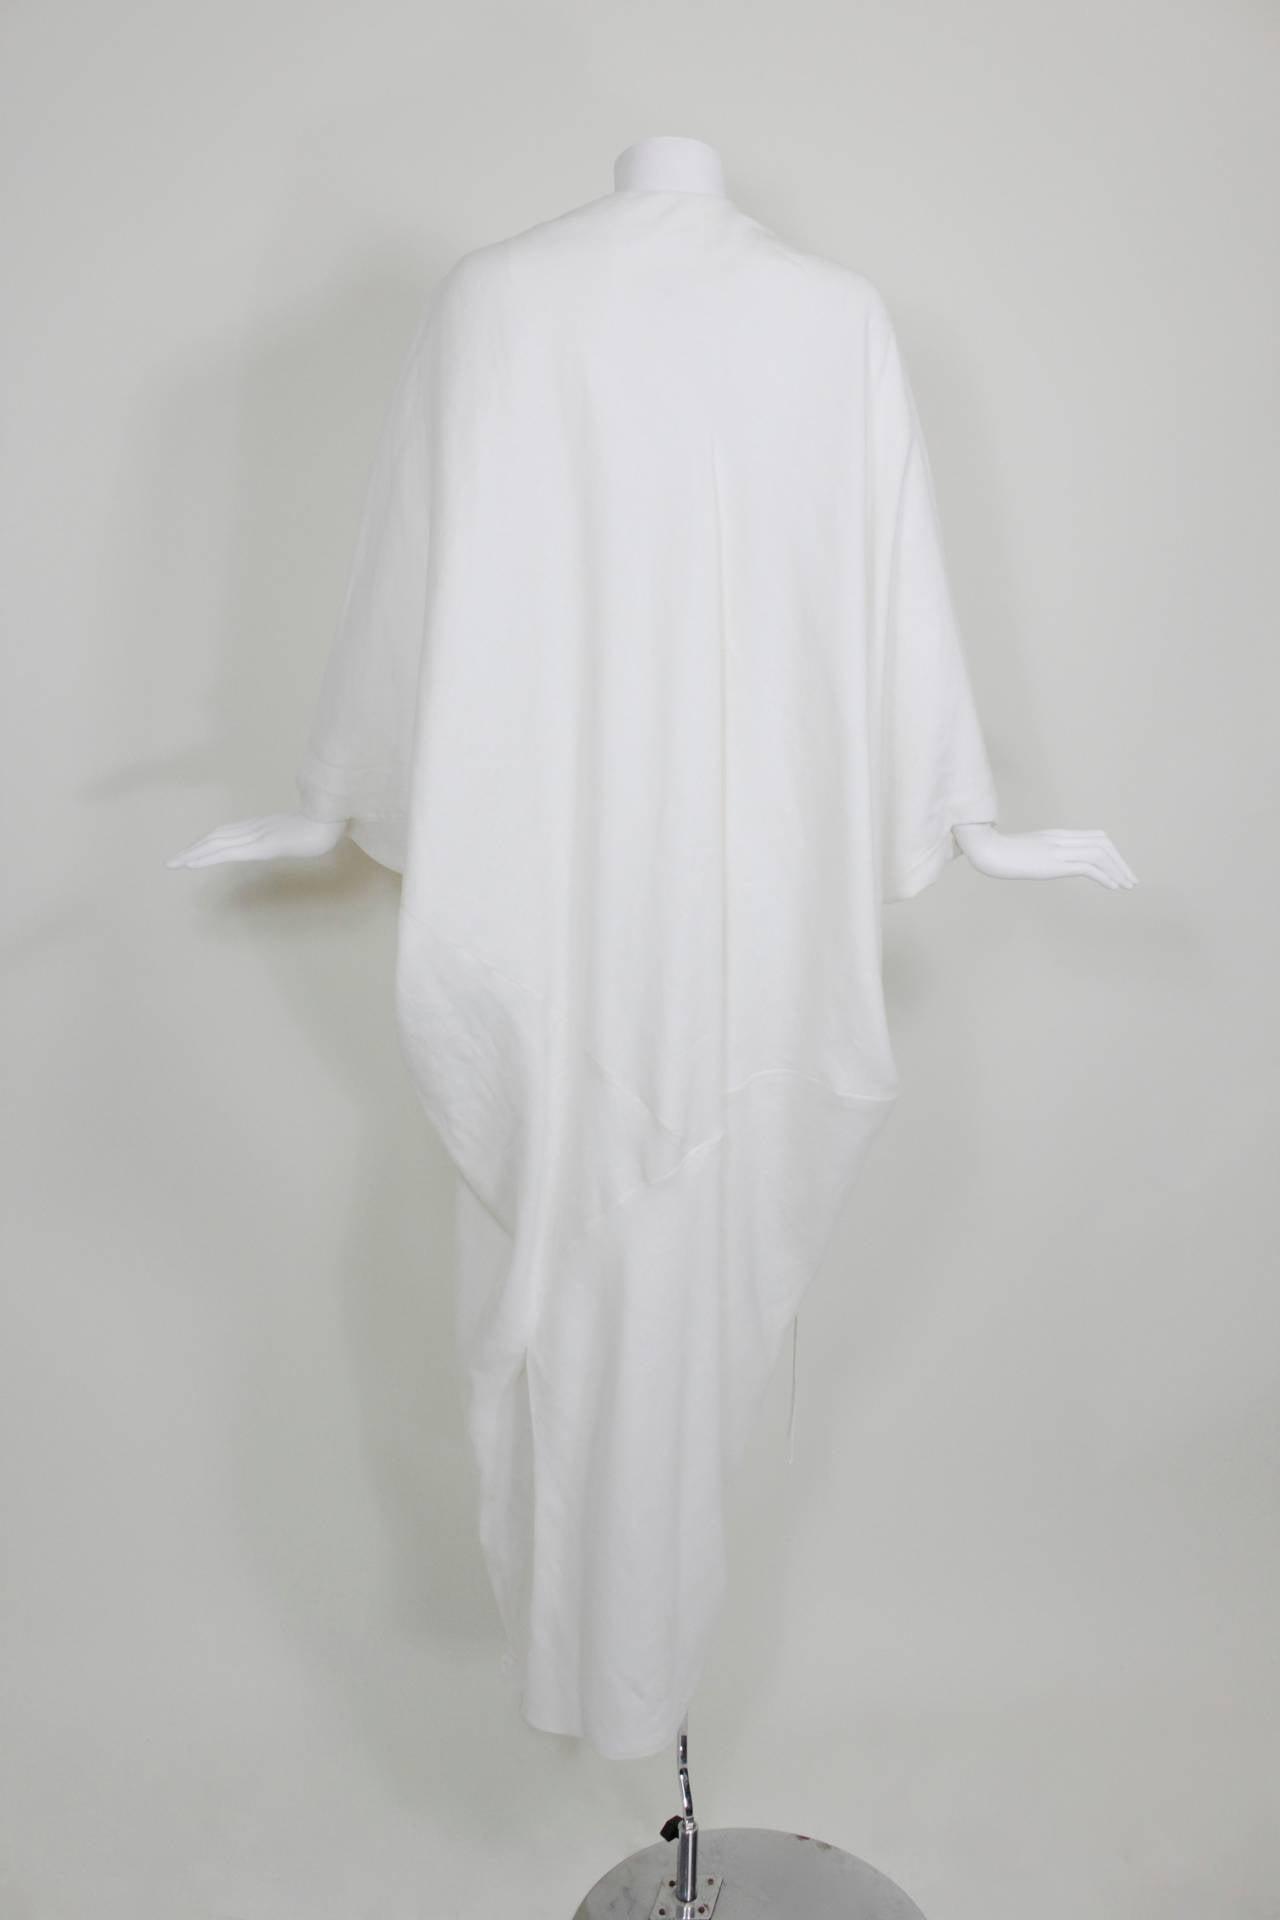 Chado Ralph Rucci White Linen Modern Caftan 4